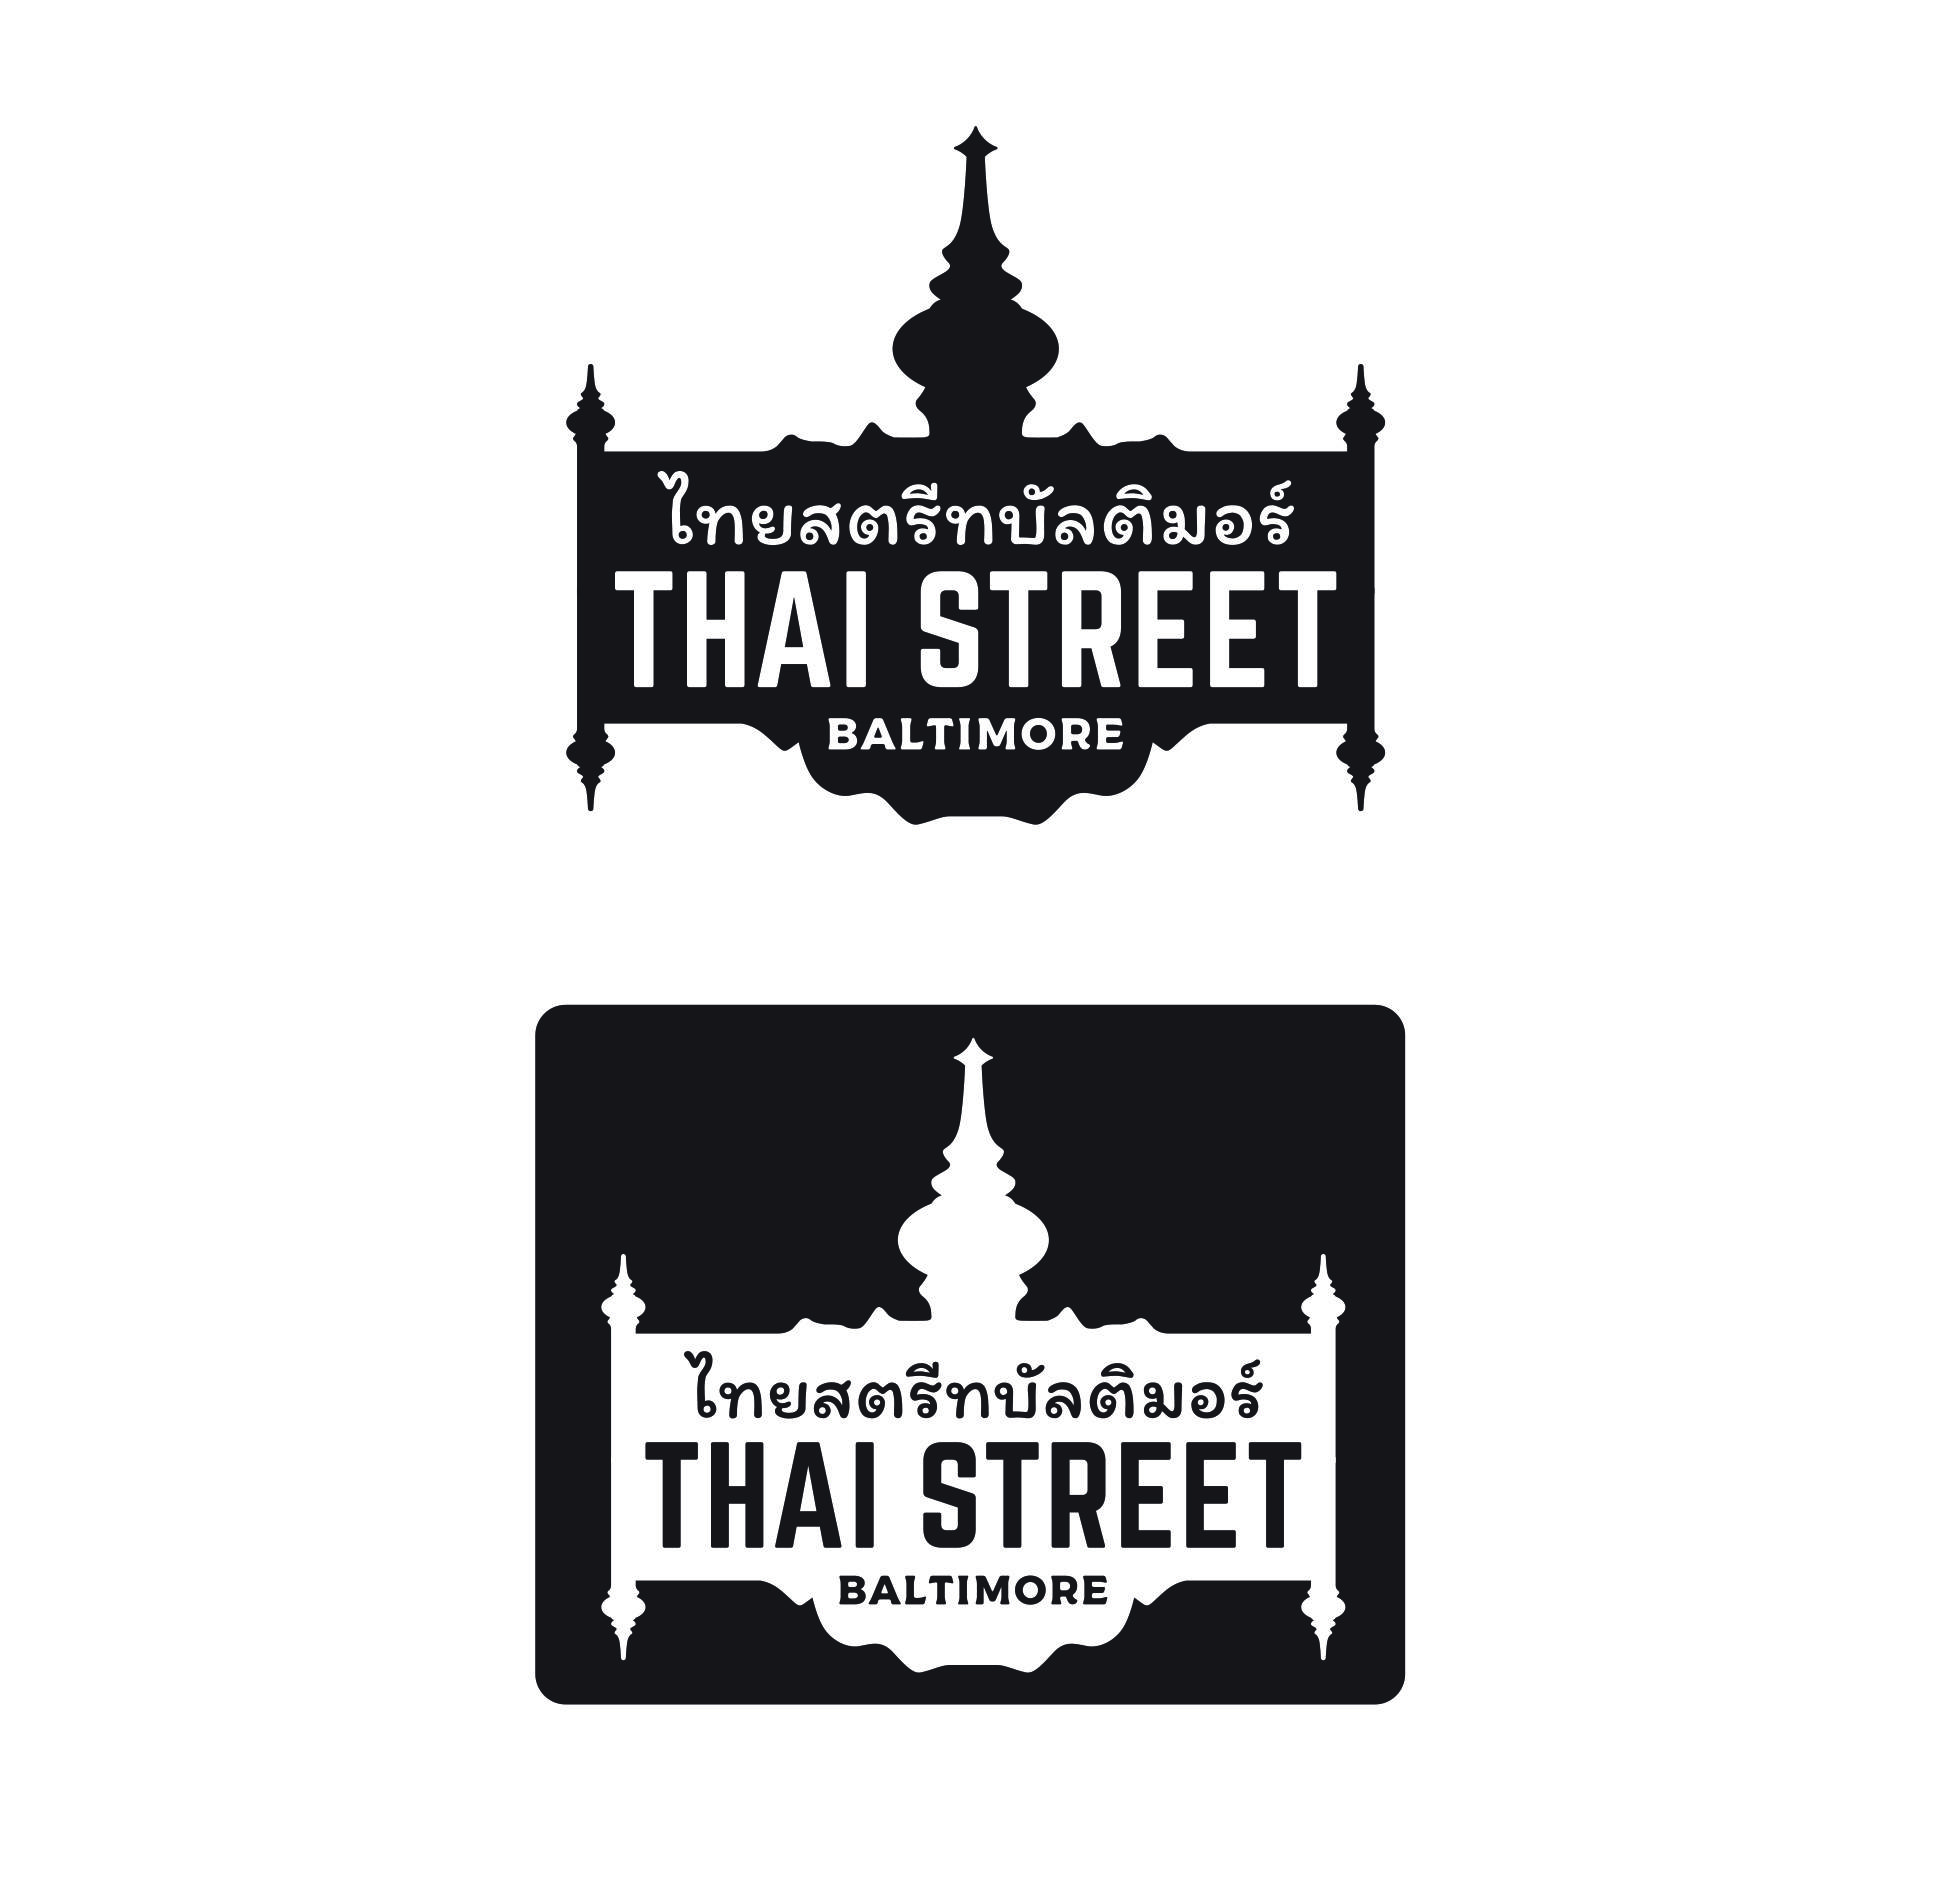 thai street news print logo.jpg